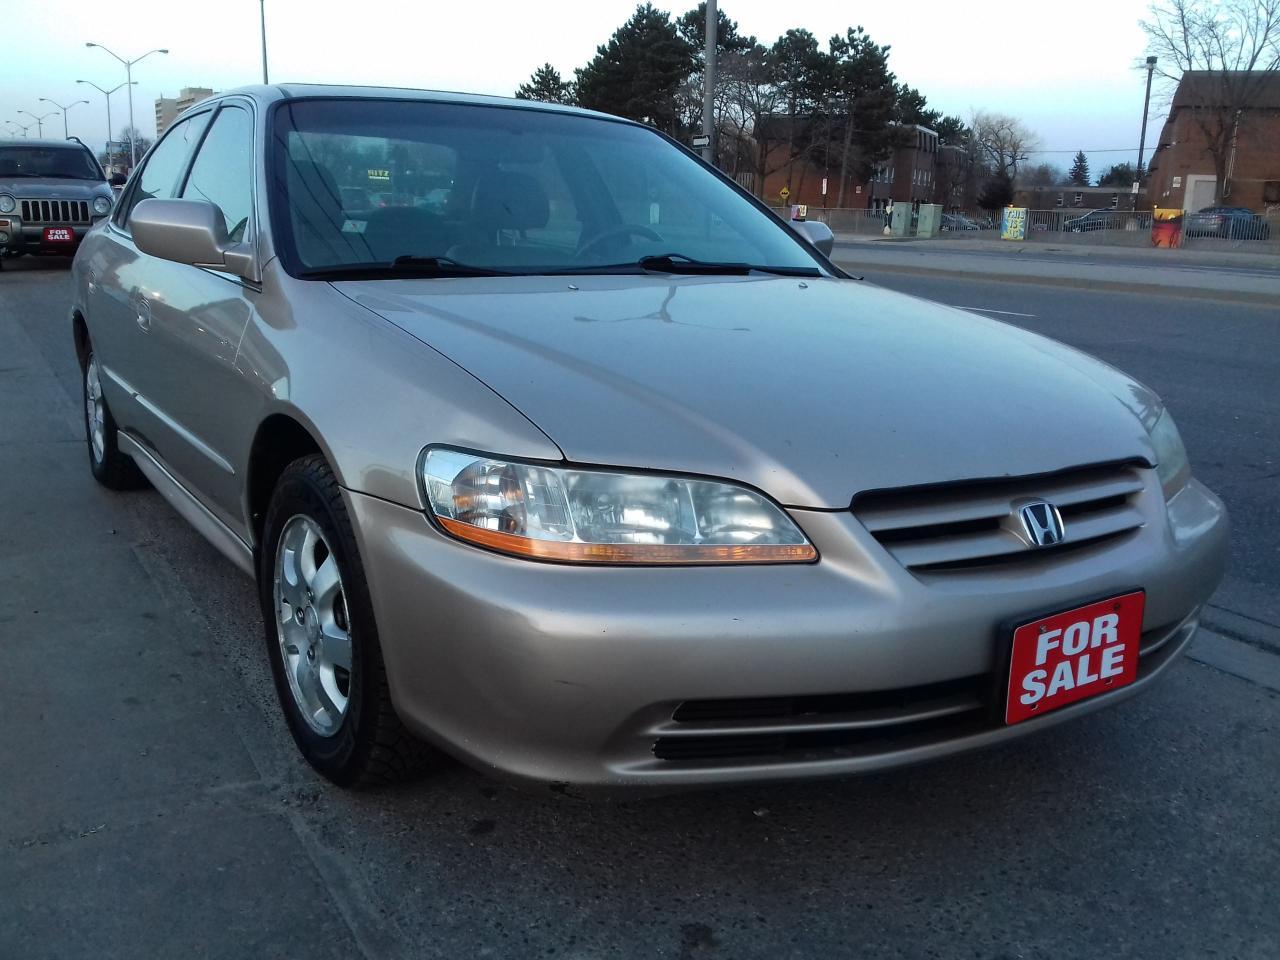 2002 Honda Accord EX - $2500 CERTIFIED